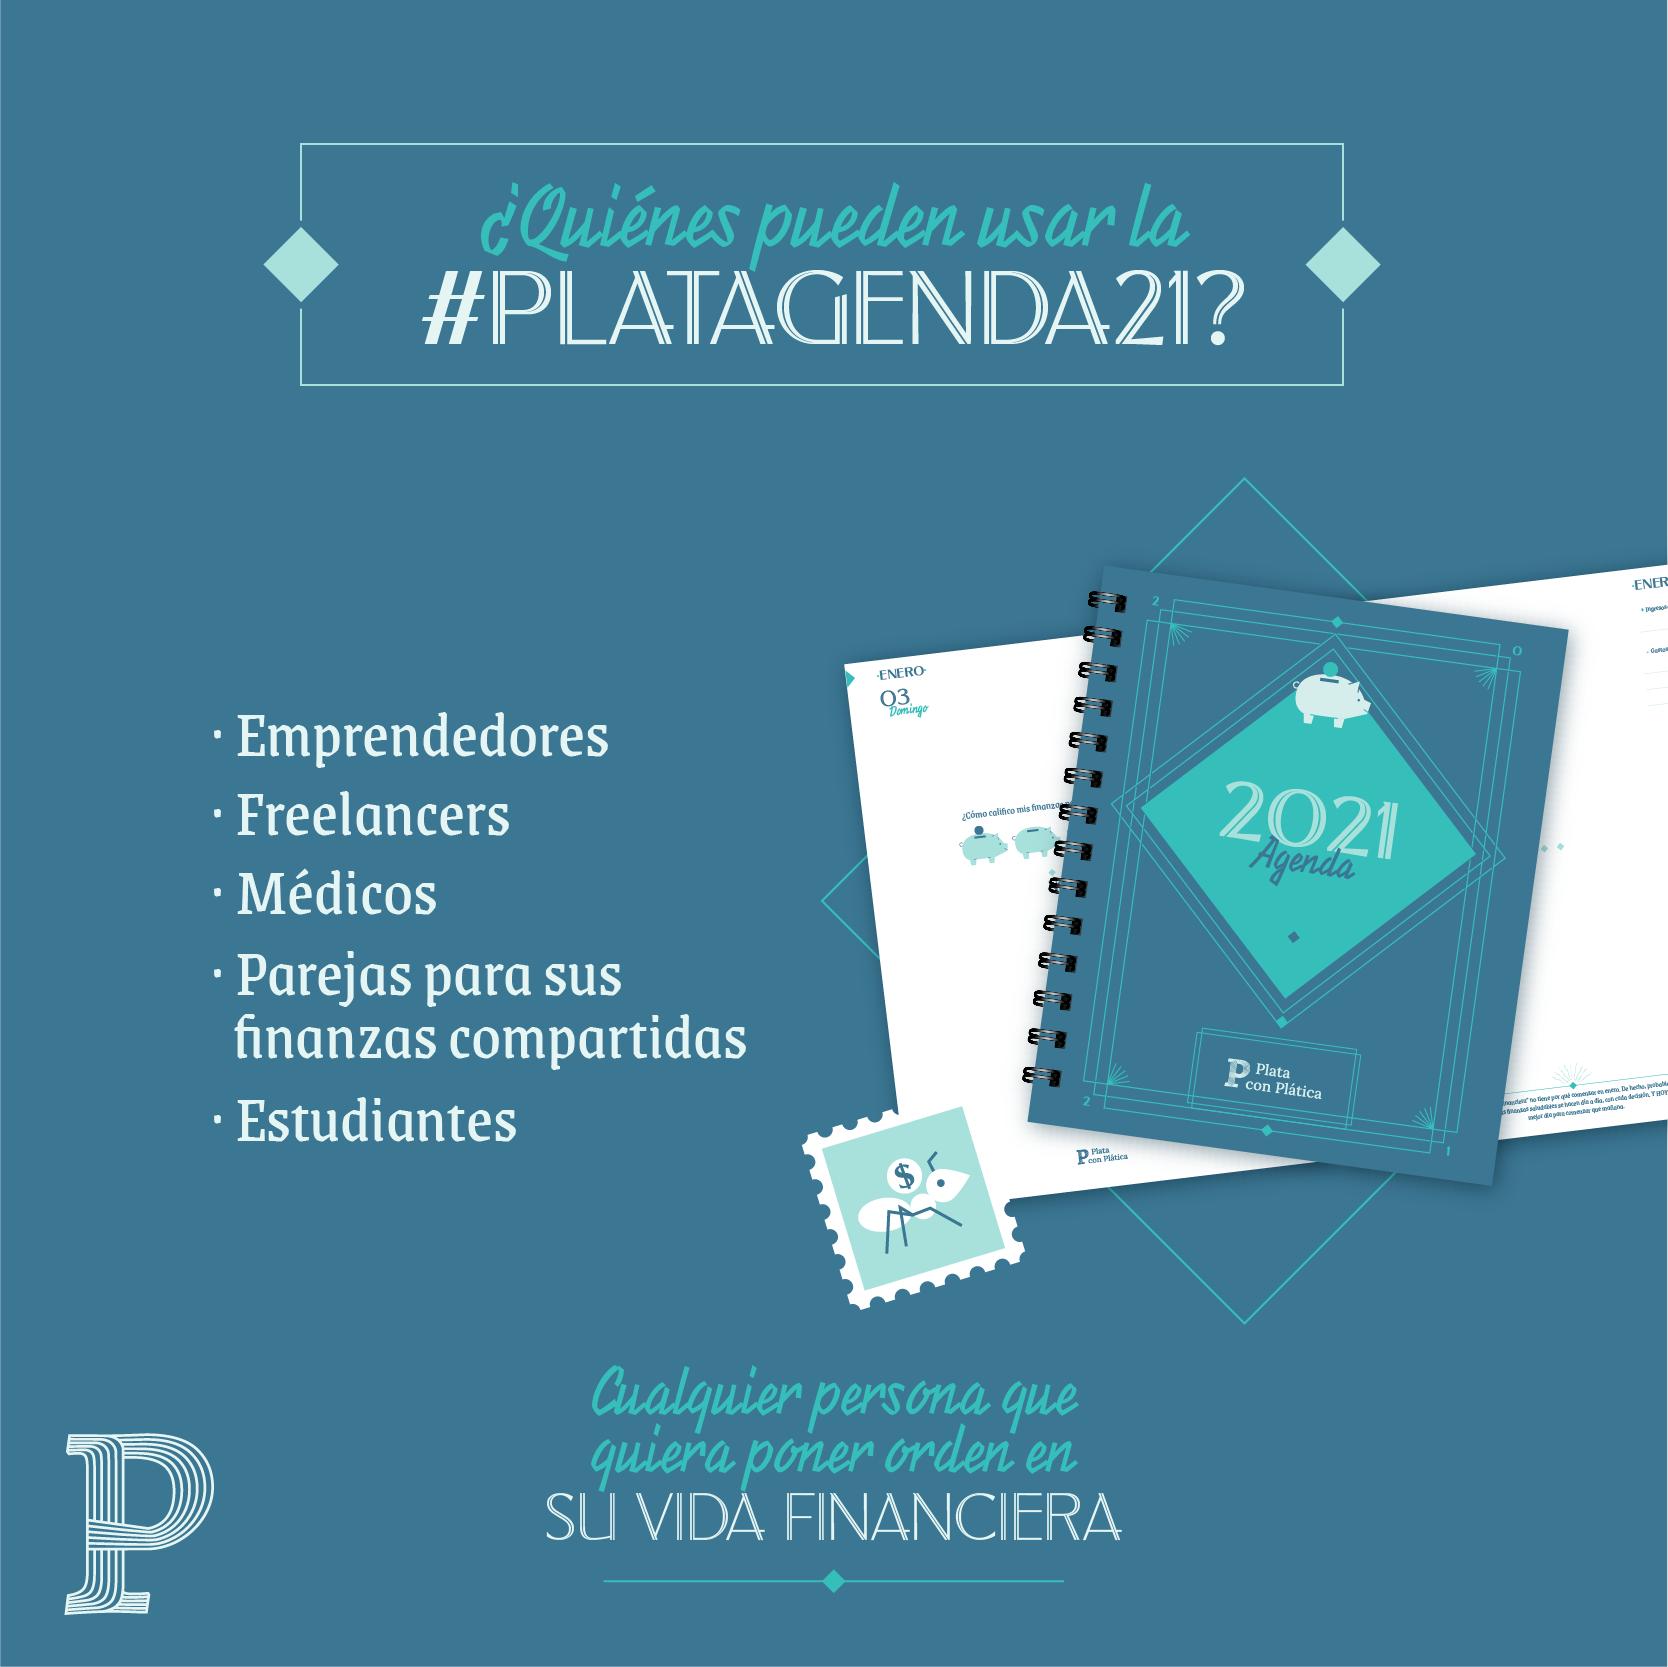 PlatAgenda